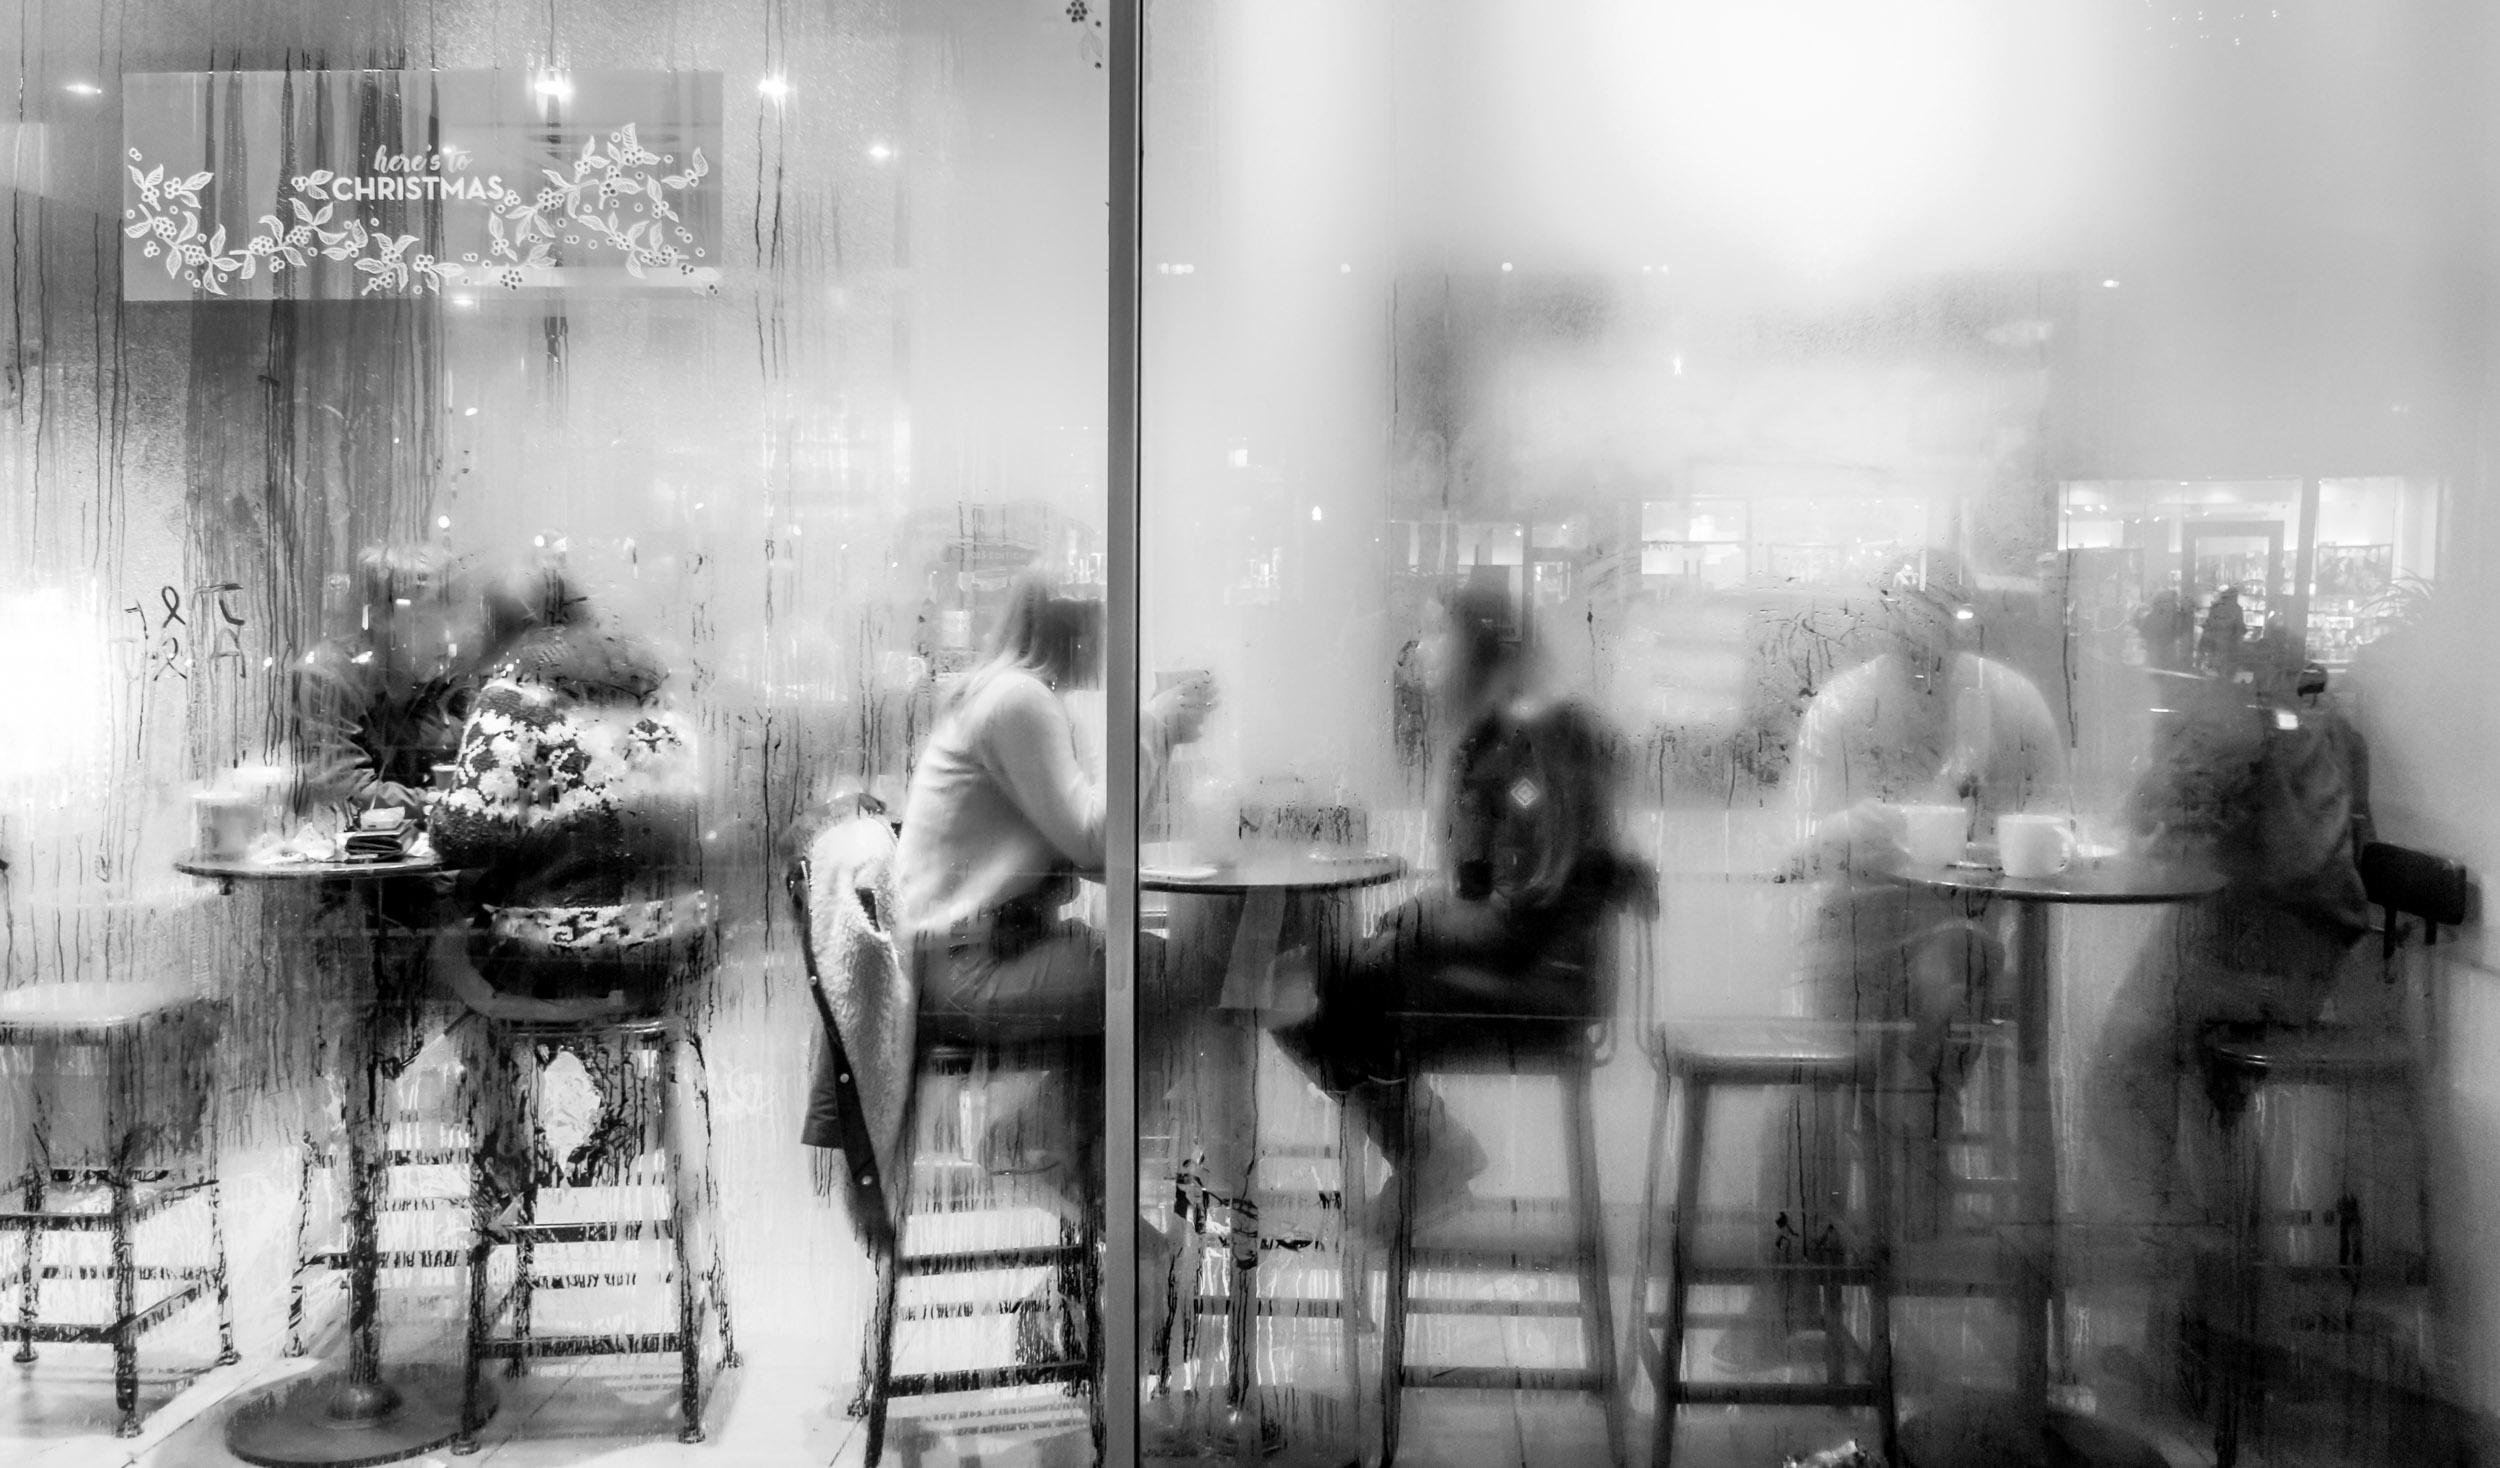 Graham Hunt B&W street photography